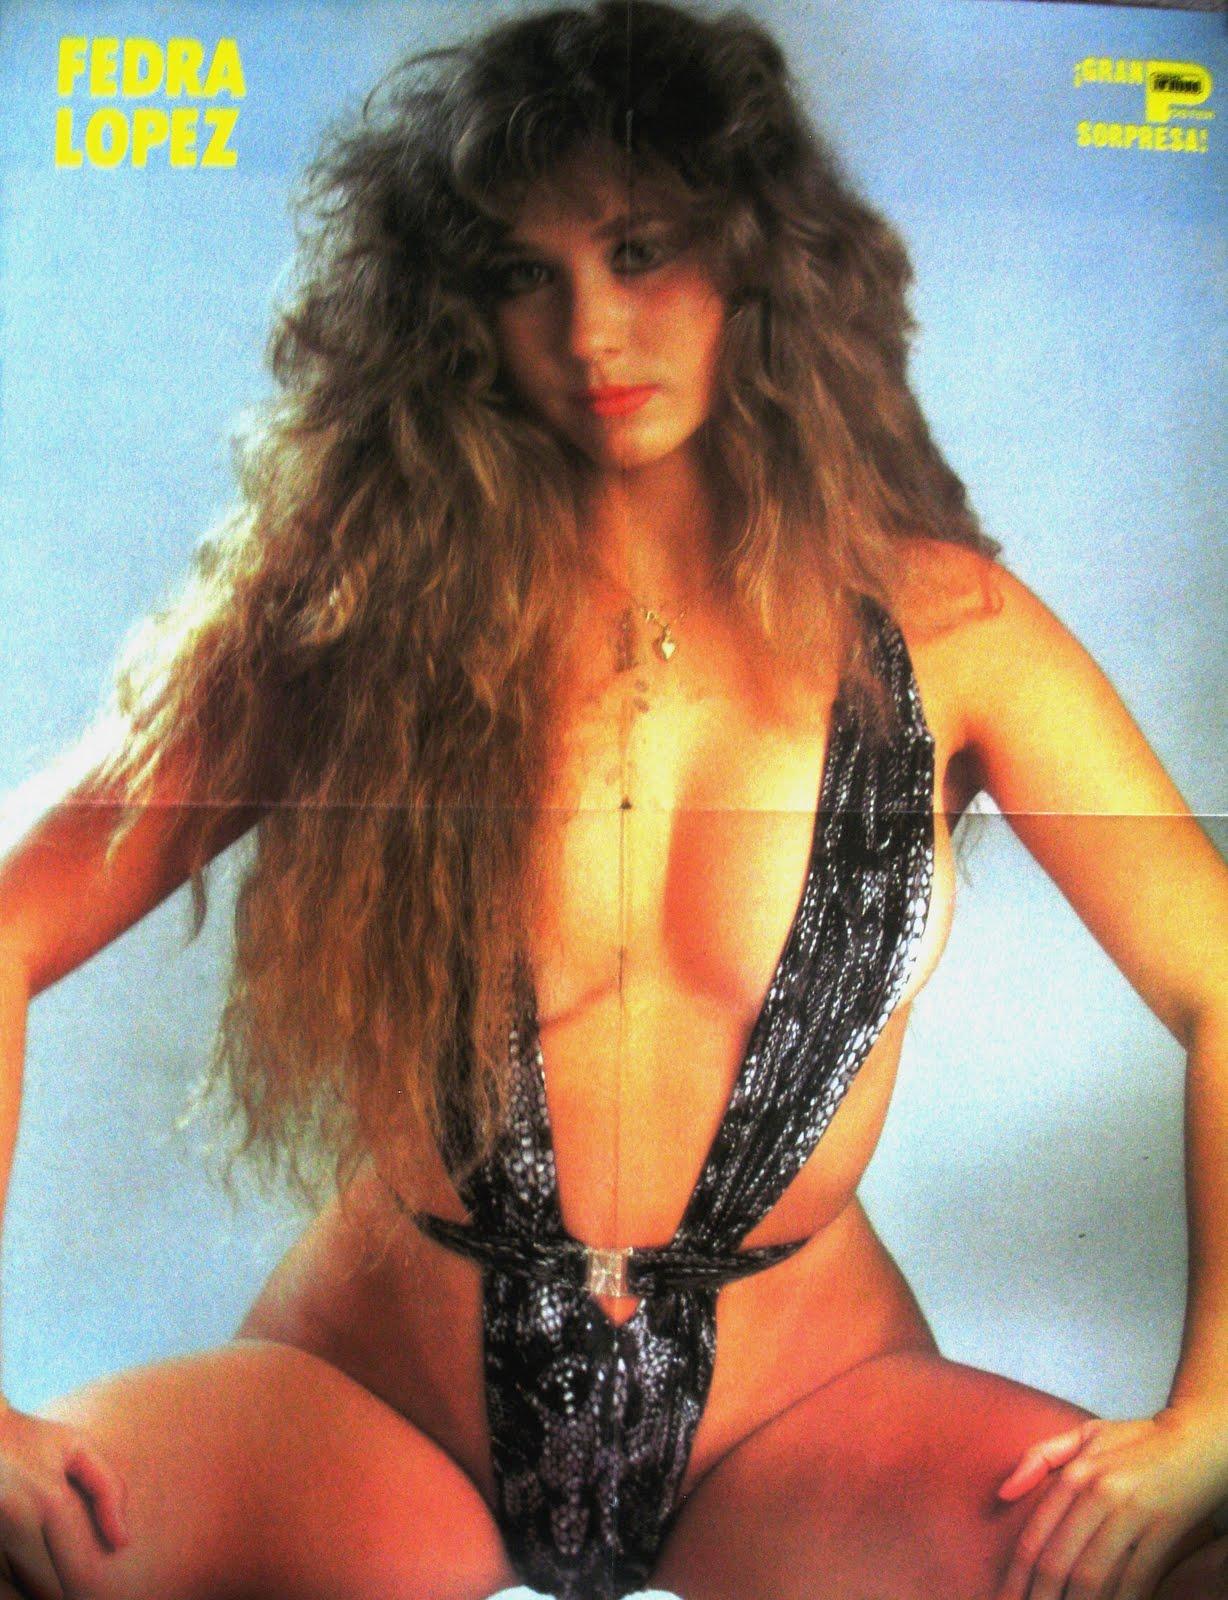 Elizabeth golder era nude pics turn on!